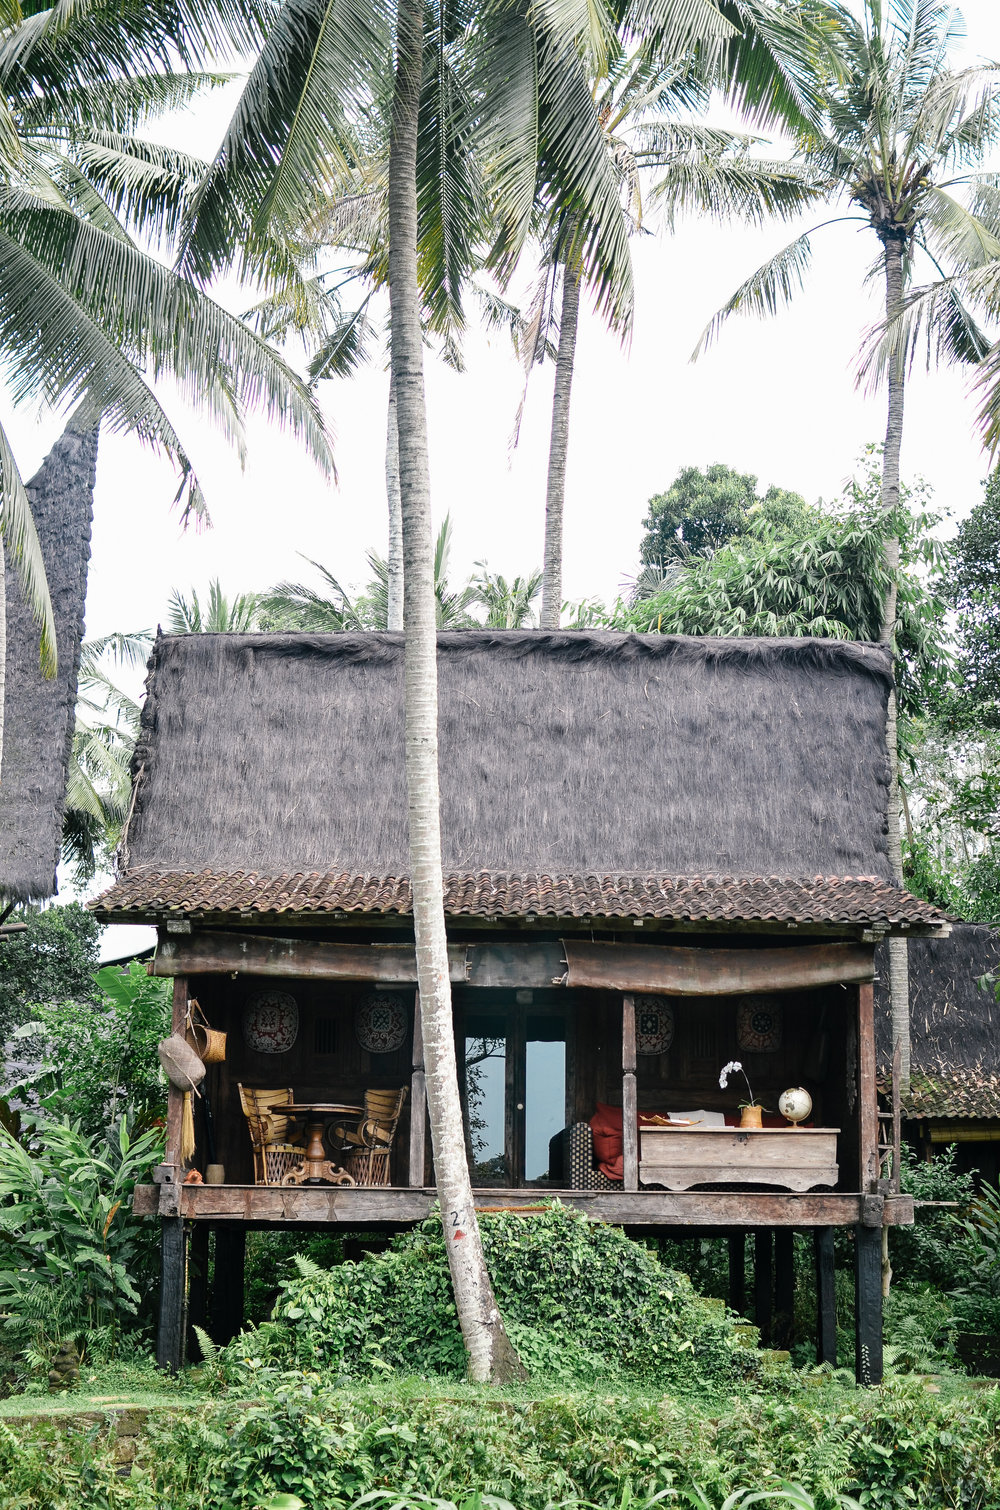 bali+mosca+bamboo+lodge+bali+ubud+lifeonpine_DSC_2811.jpg